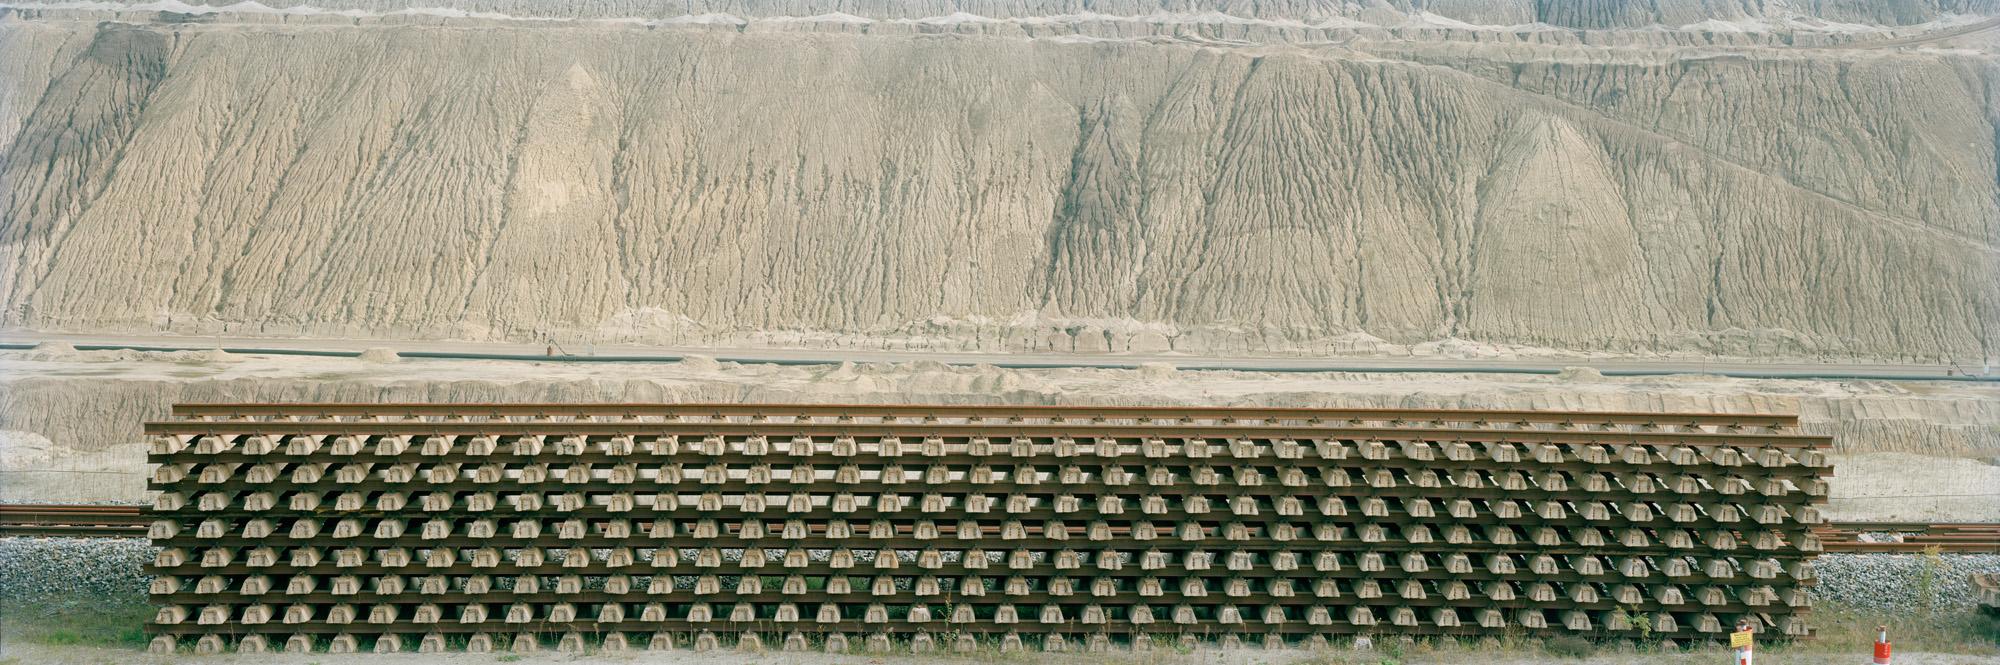 large format photography, Grossformatfotografie, Grossformatphotographie, Fotografie, Photographie, photography, 6x17, Tagebau, Braunkohle, Braunkohleabbau, Umwelt, Natur, braun, Erde, Gestein, Sand,